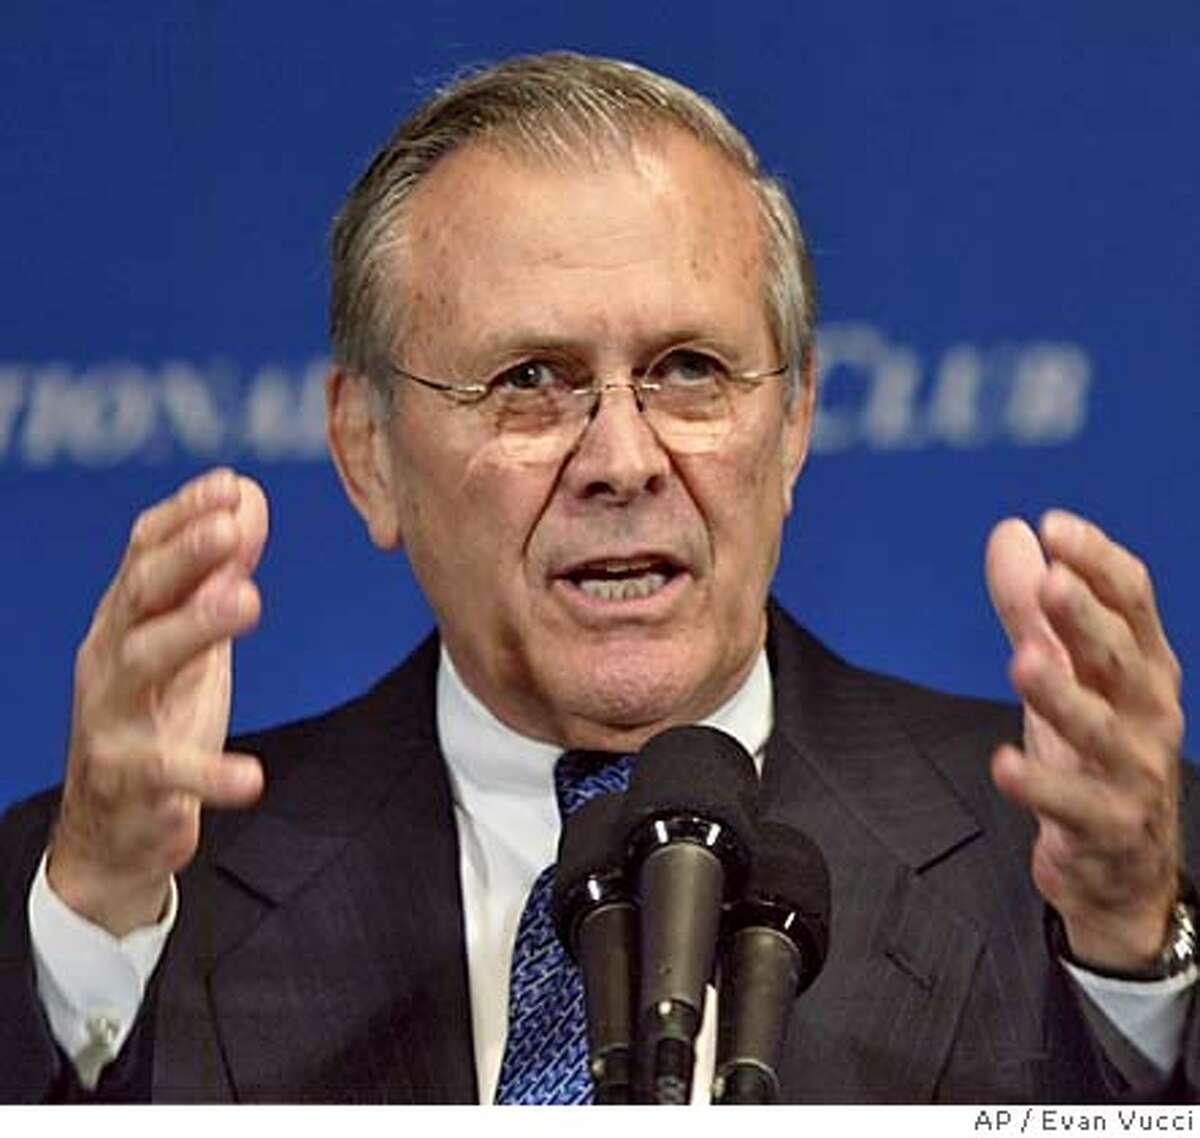 Secretary of Defense Donald Rumsfeld gestures during a speech at the National Press Club on Friday, Sept. 10, 2004 in Washington. Rumsfeld discussed the global war on terrorism. (AP Photo/Evan Vucci) Ran on: 09-11-2004 Donald Rumsfeld Ran on: 09-11-2004 Donald Rumsfeld Ran on: 09-11-2004 Donald Rumsfeld